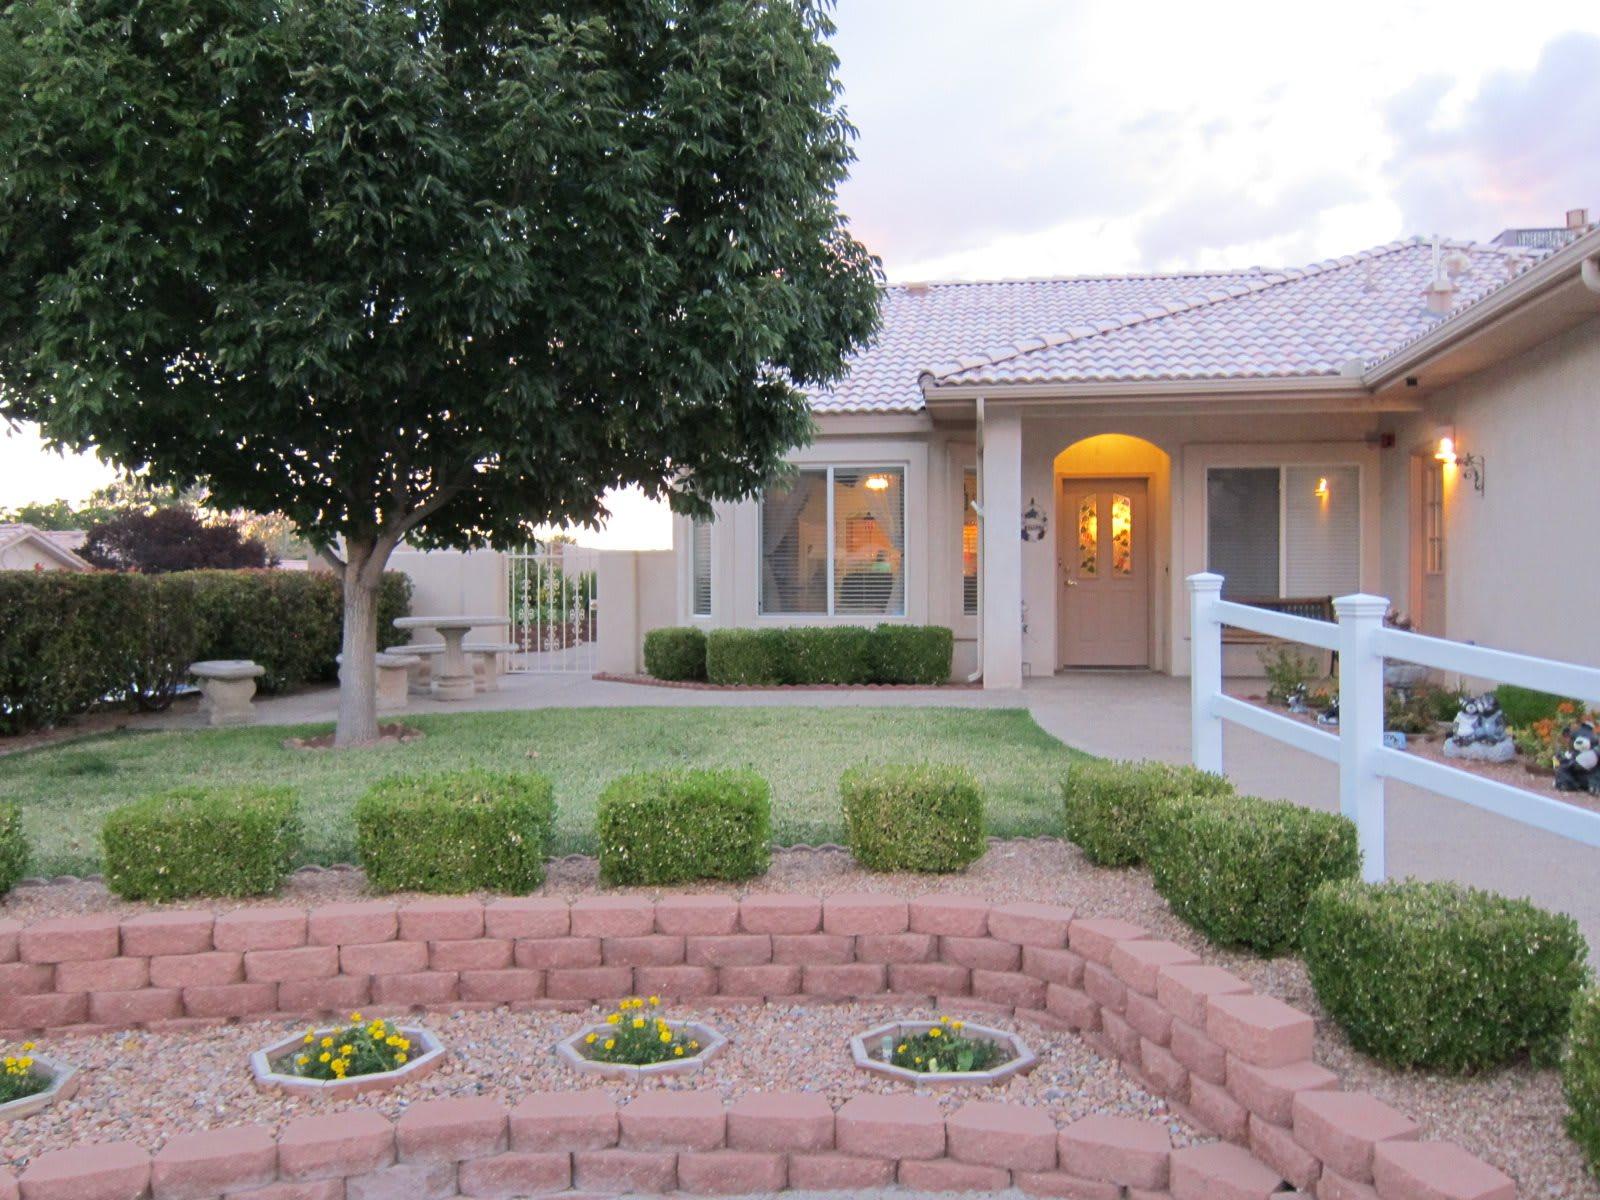 Photo 1 of Buena Vista Senior Care